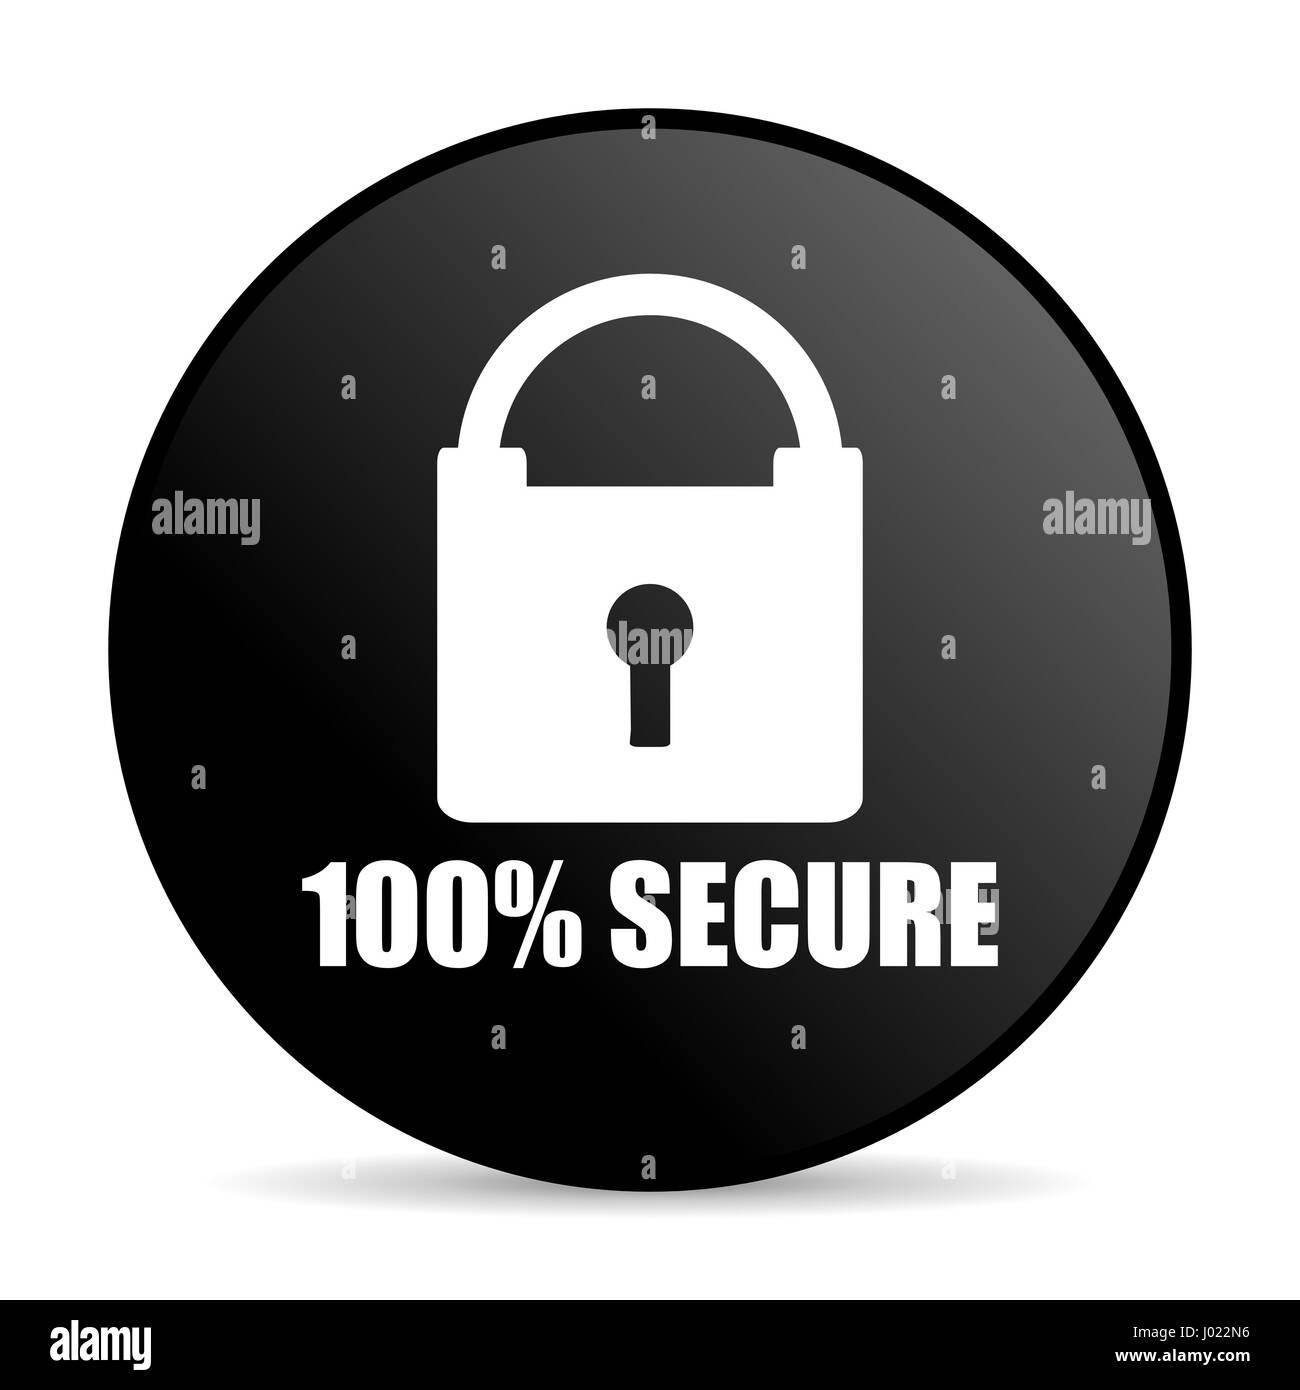 Secure black color web design round internet icon on white background. - Stock Image